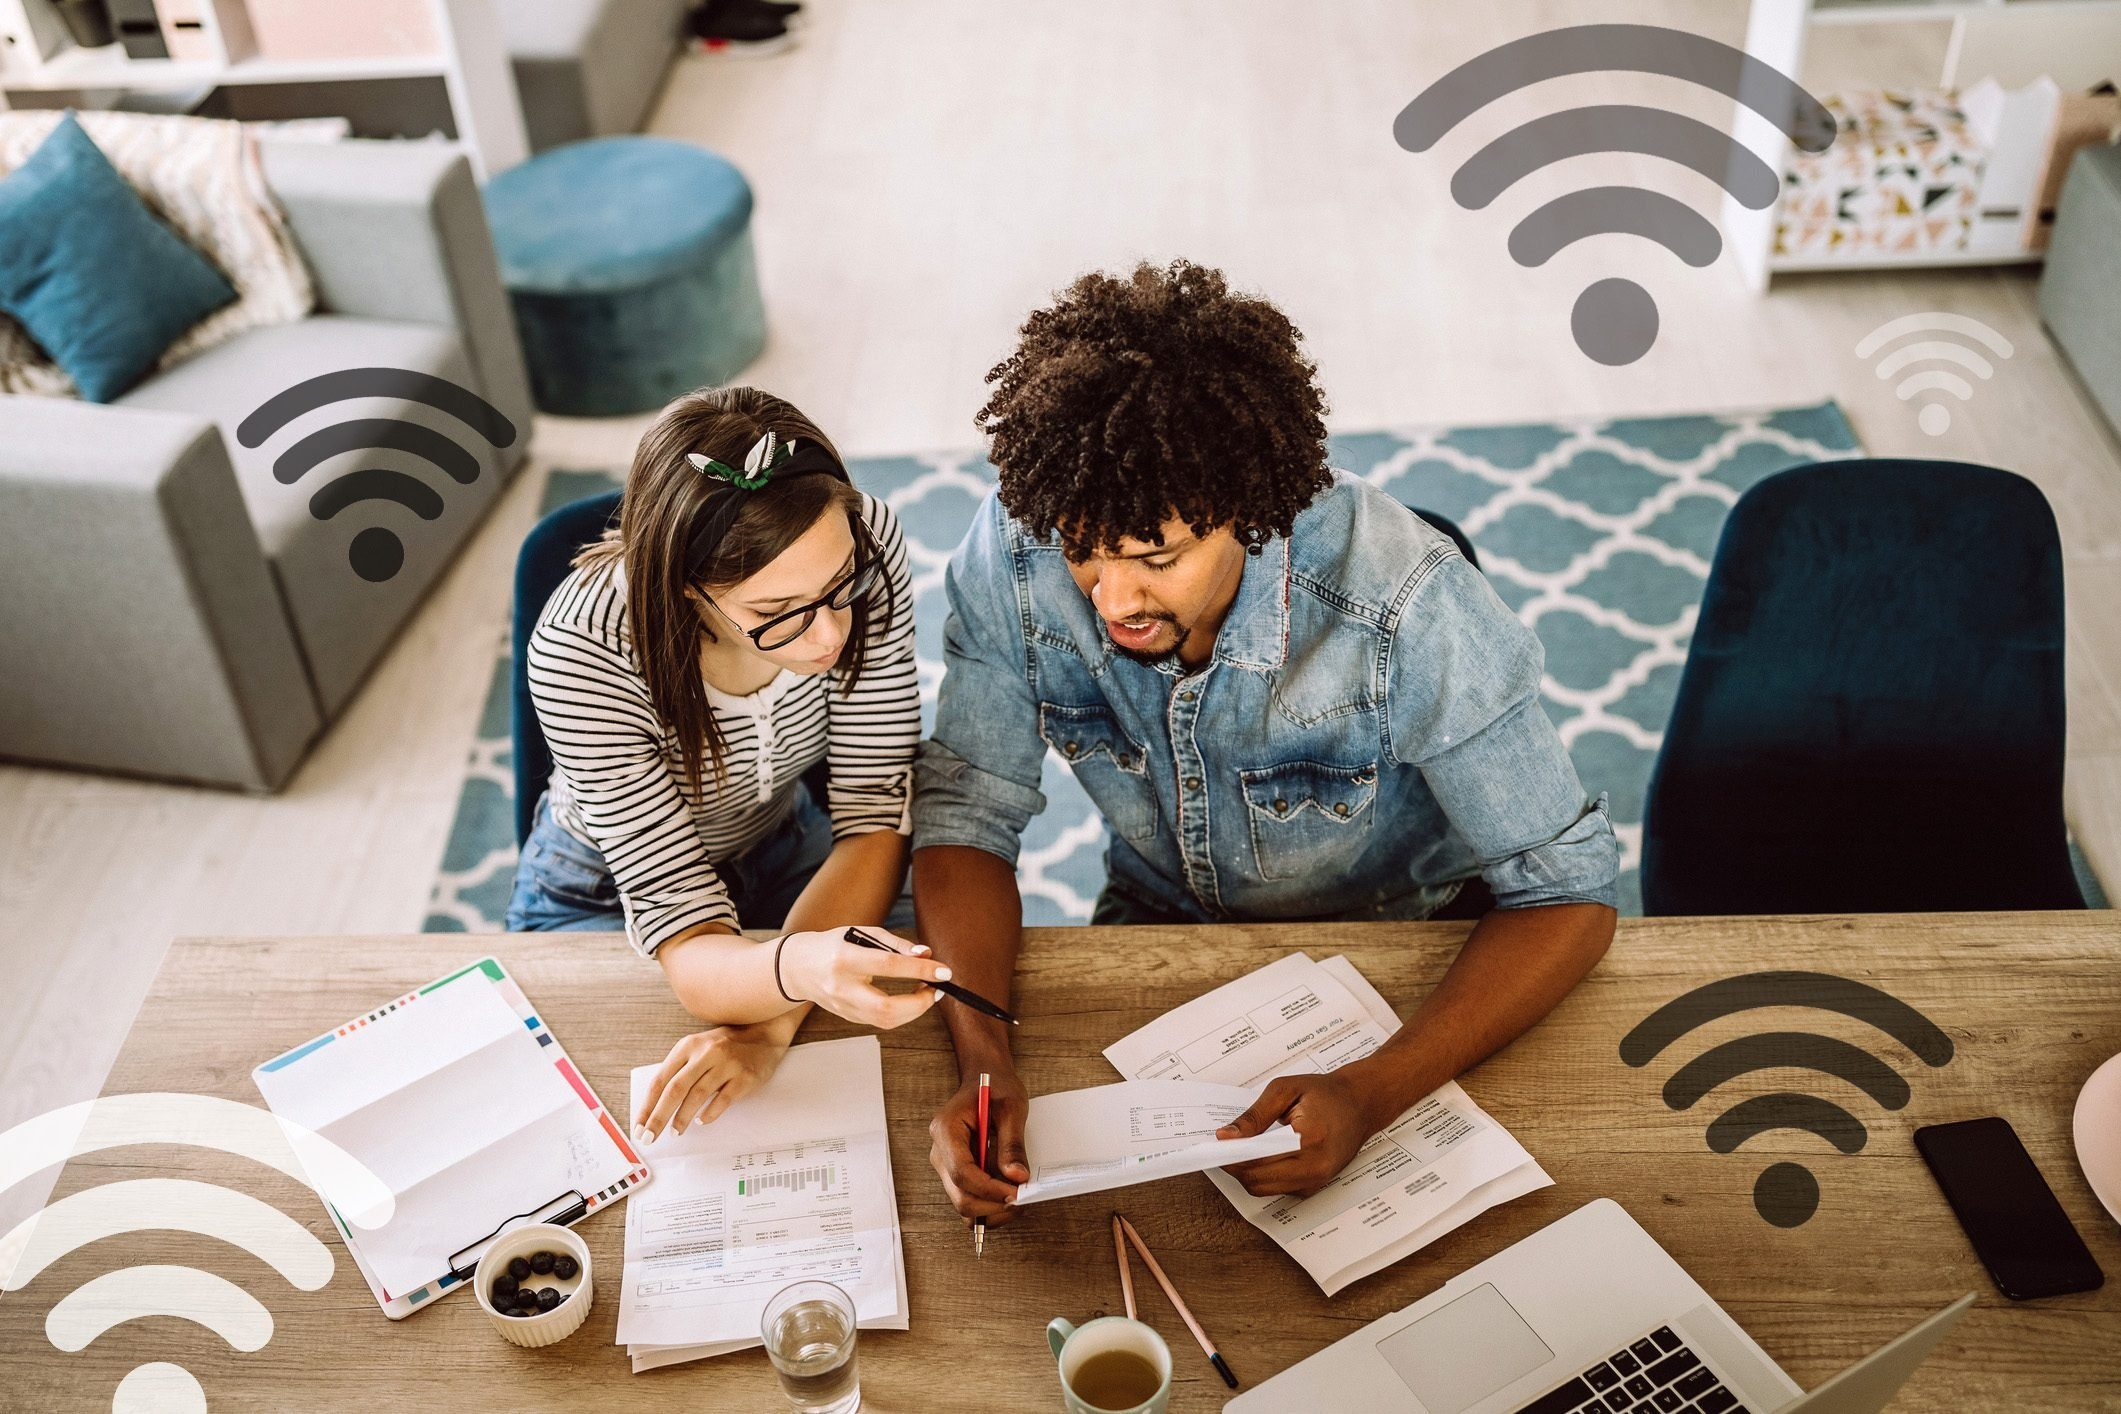 stolen wifi high bills